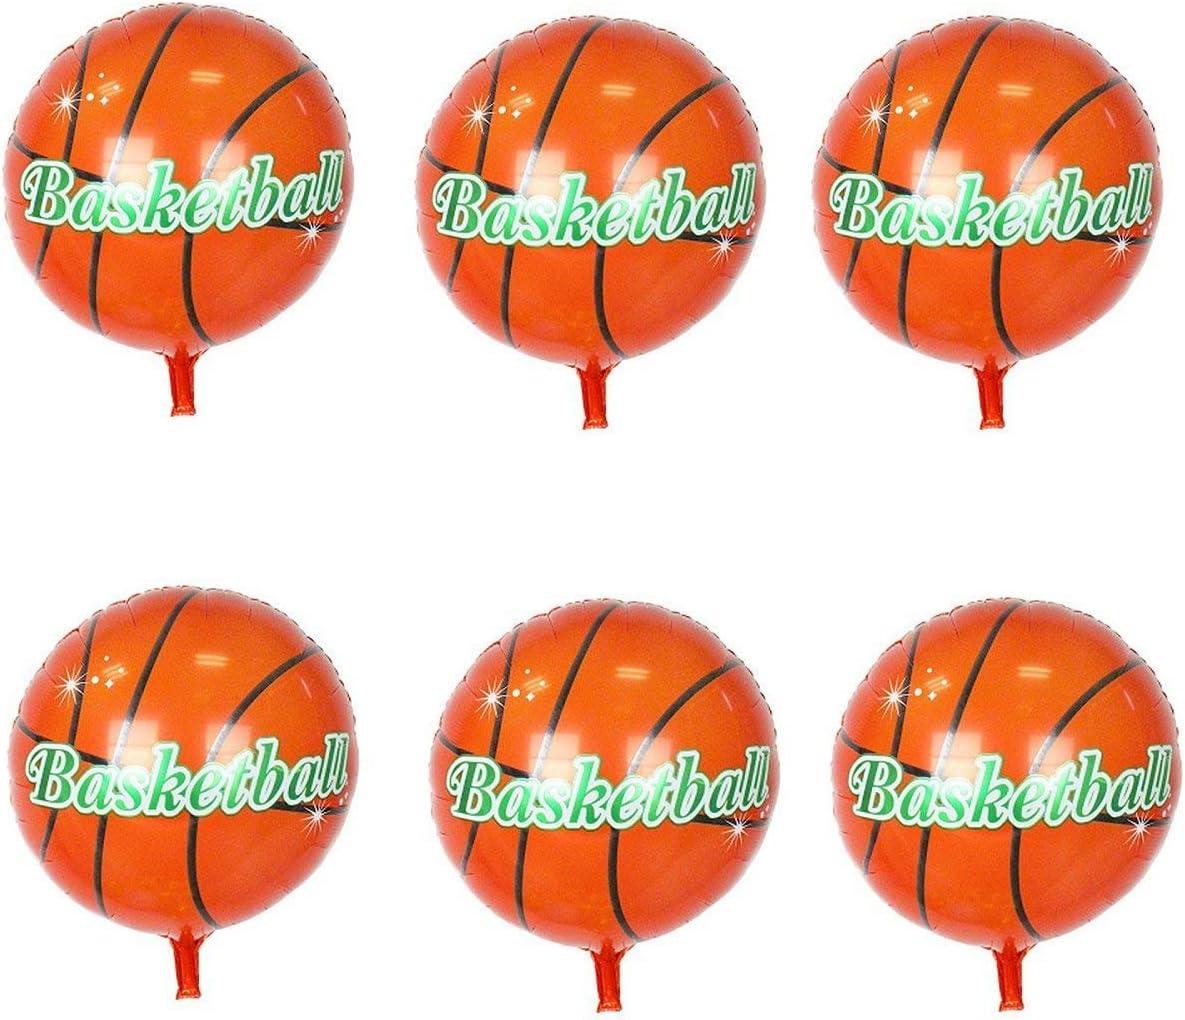 Kodoria 6 unids Balones de Baloncesto Helio Foil Mylar Baloncesto ...